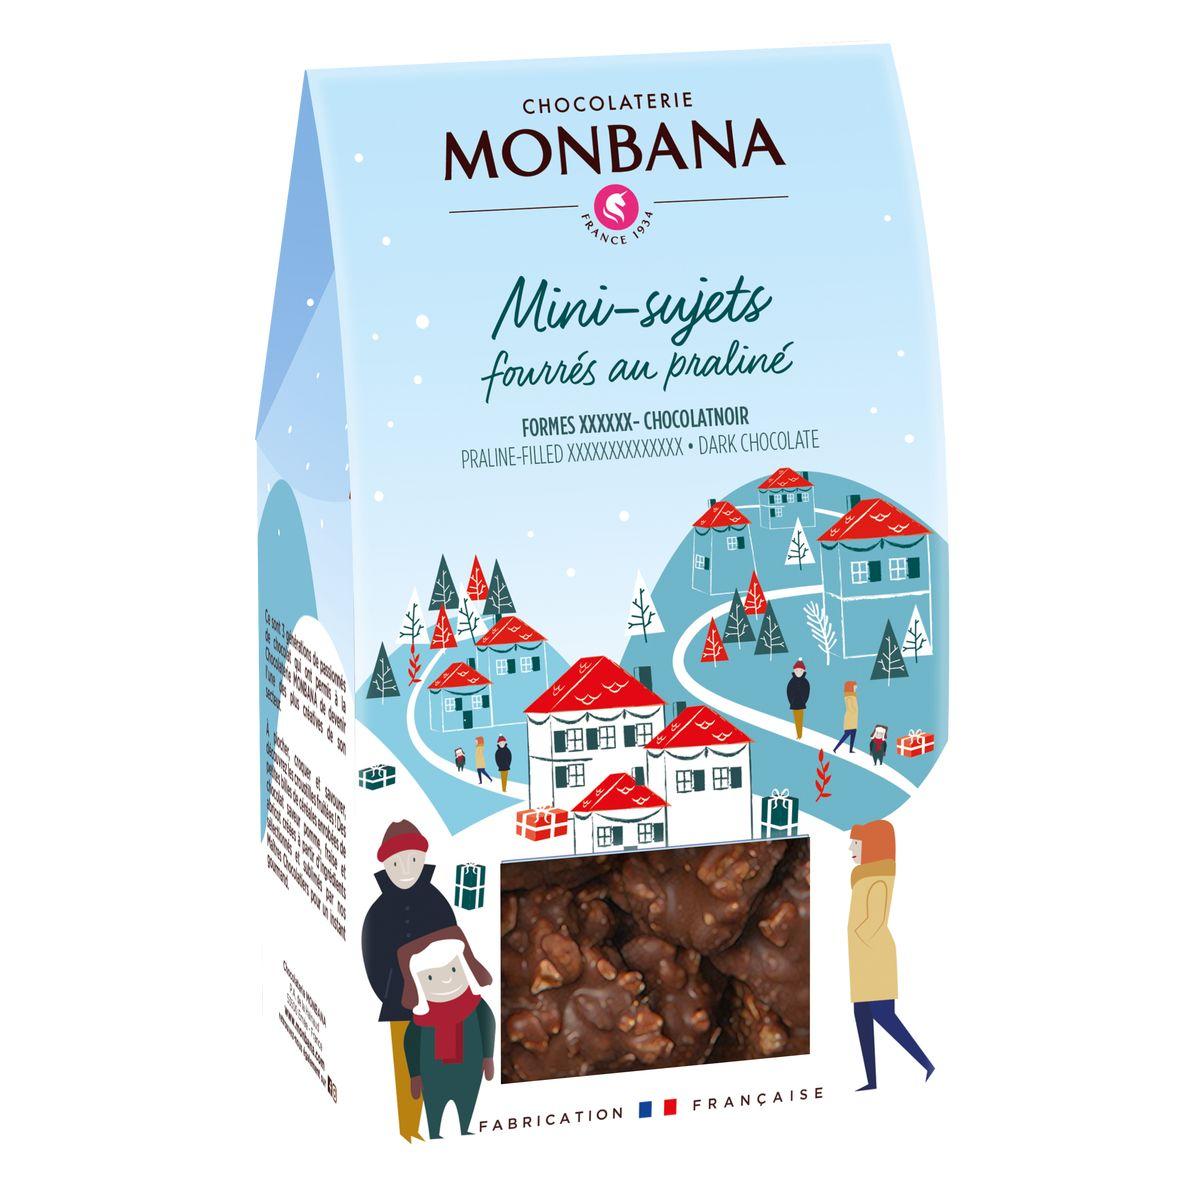 Mini sujets noel chocolat noir 130g - Monbana